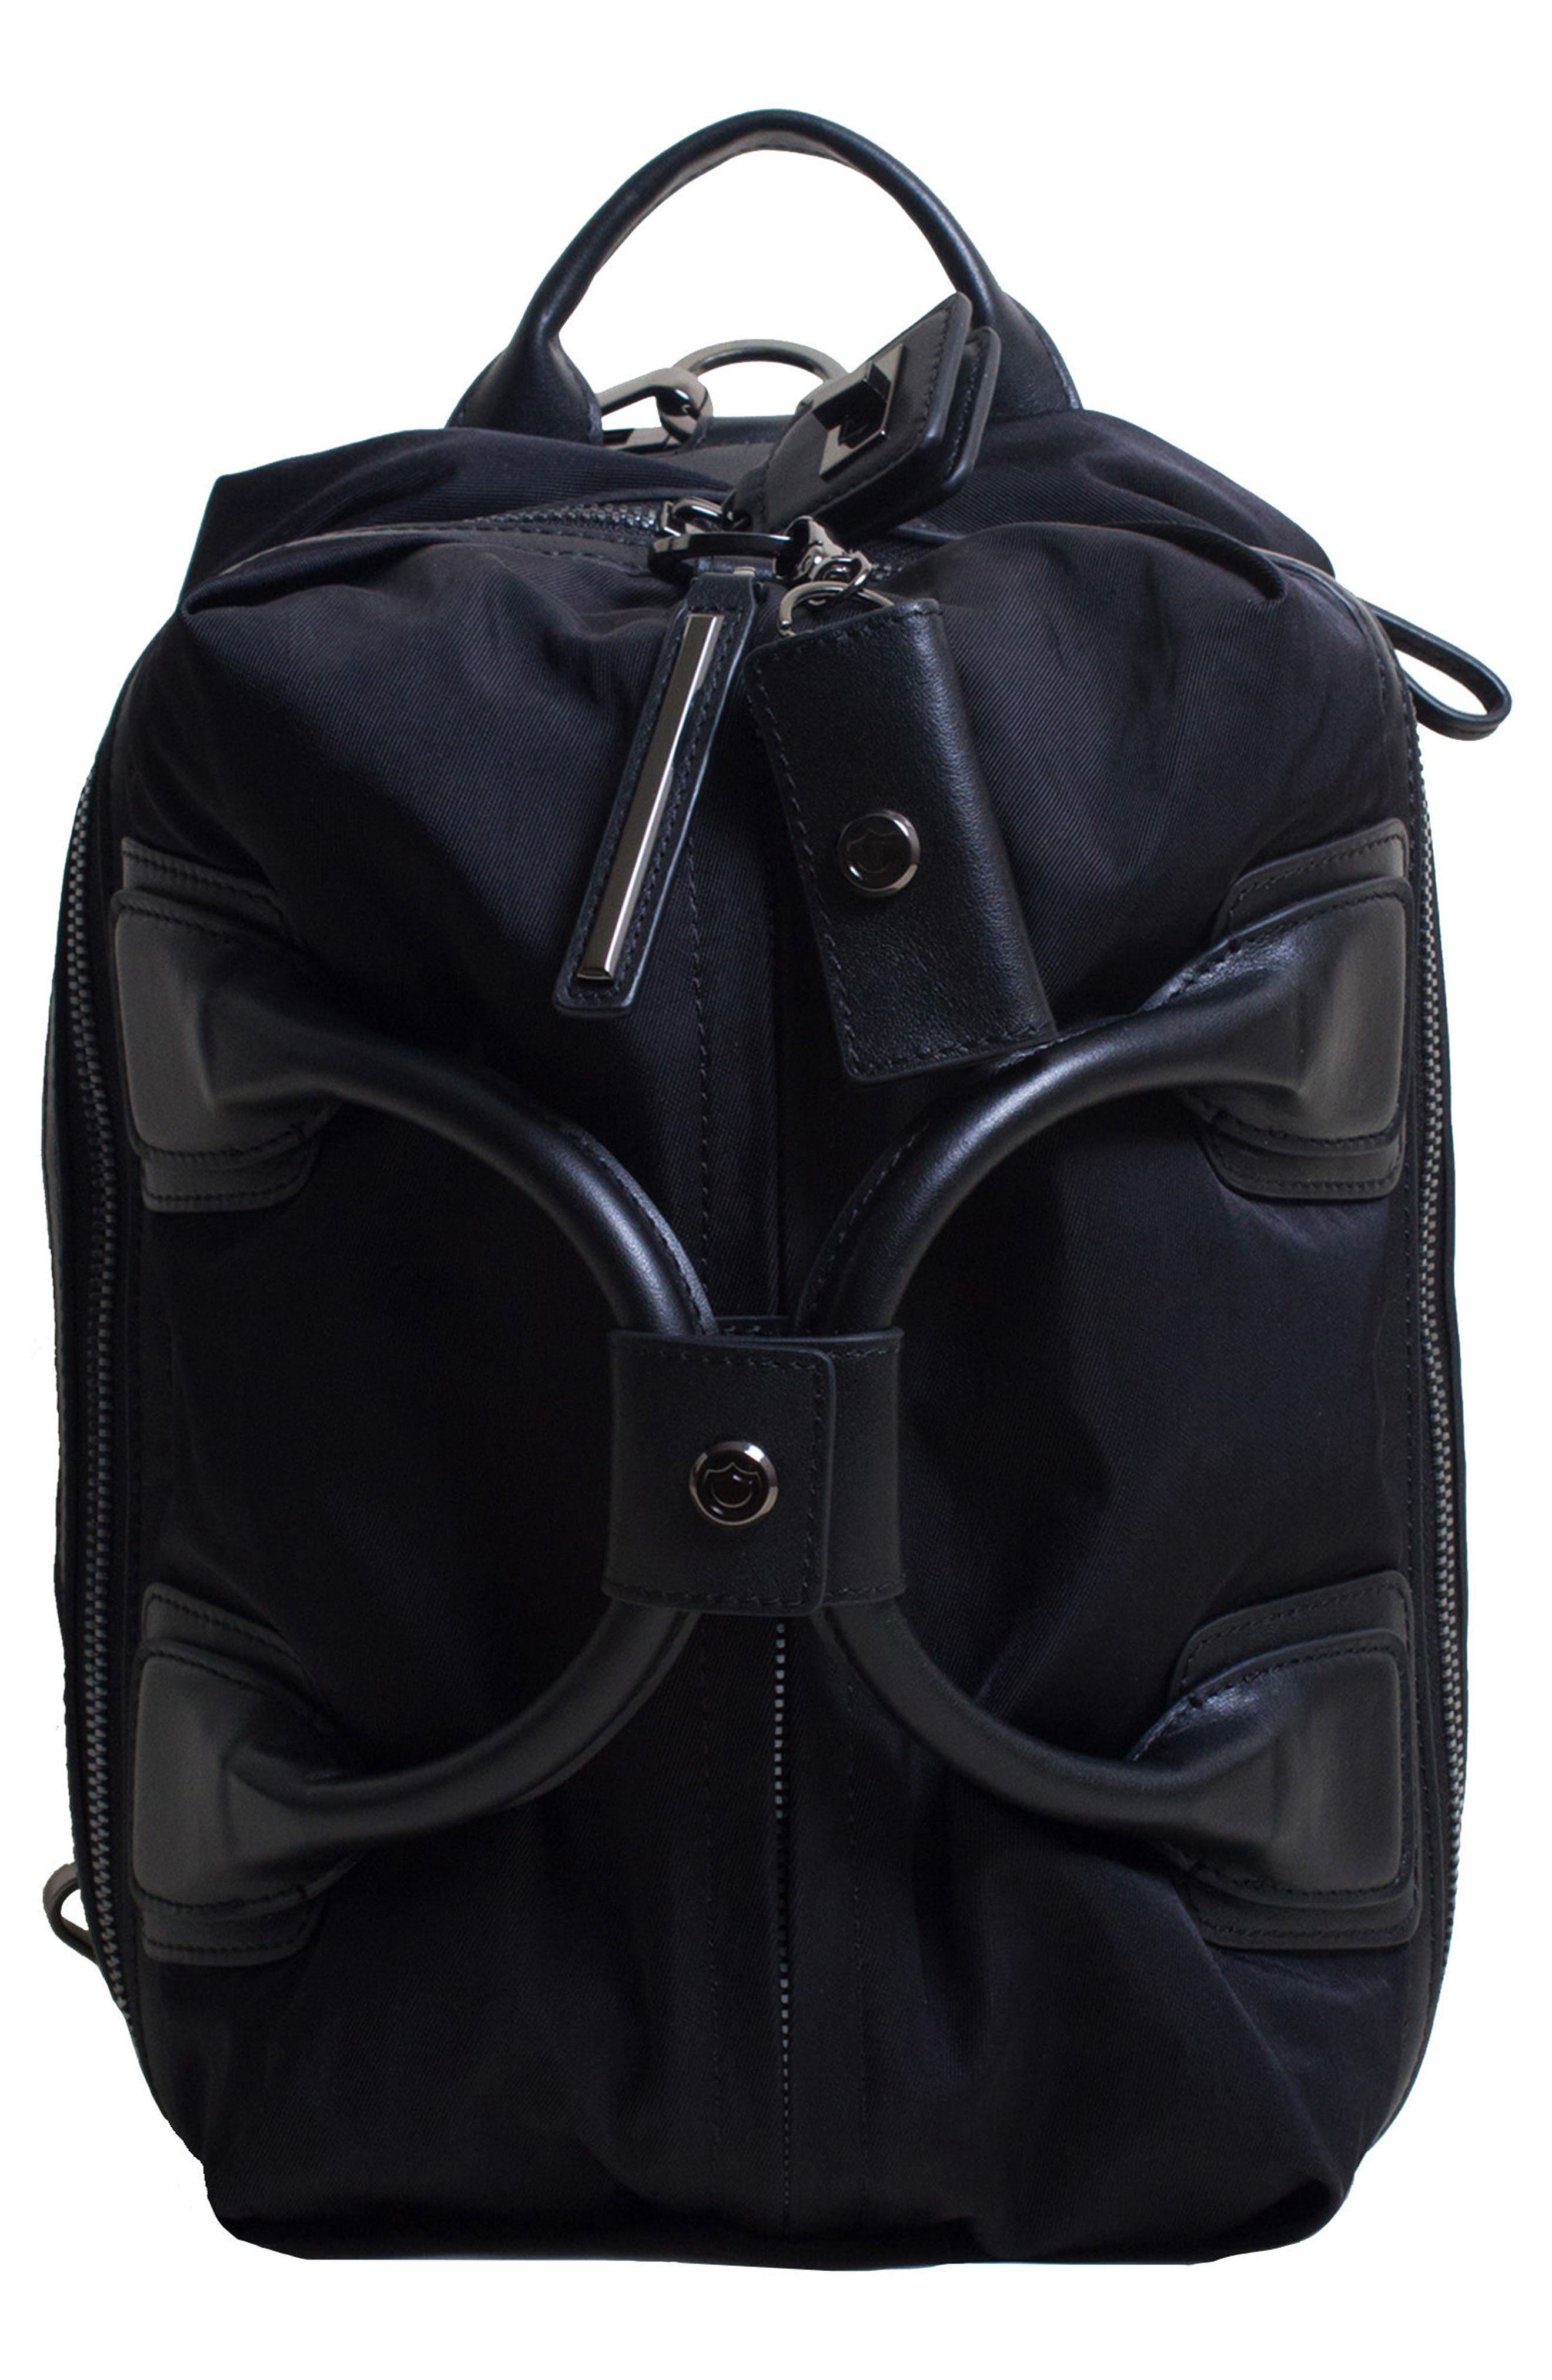 Studio Medium Duffel Backpack,                             Main thumbnail 1, color,                             BLACK